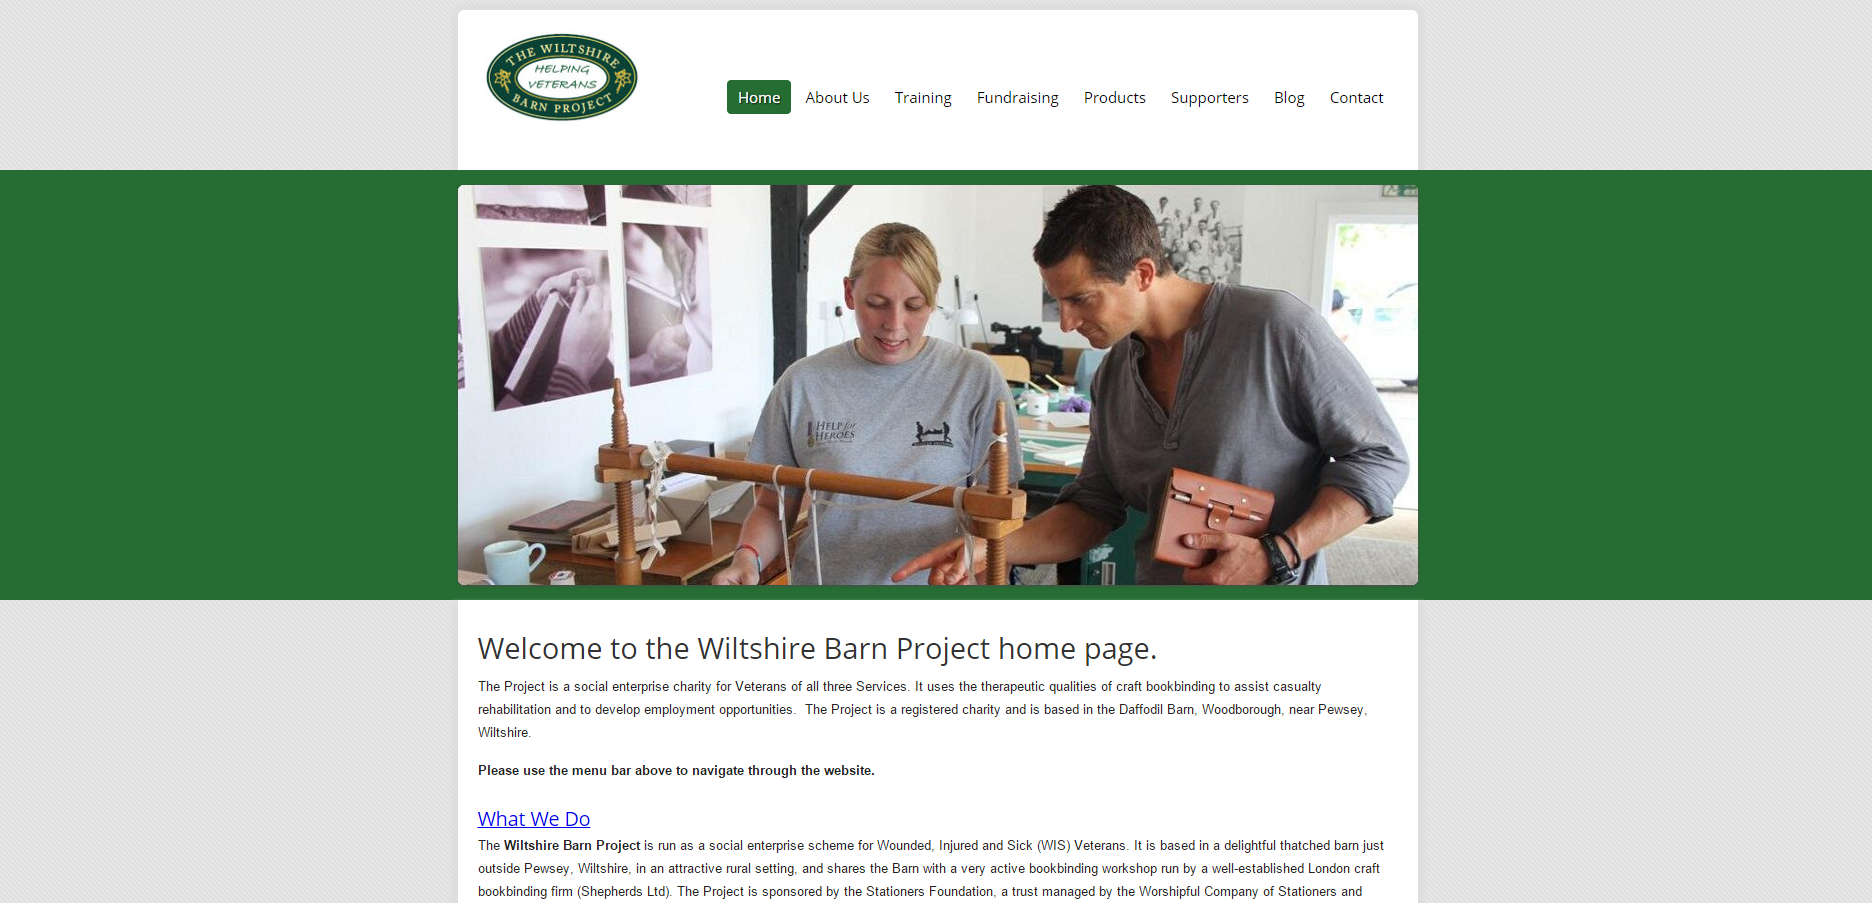 Wiltshire Barn Project